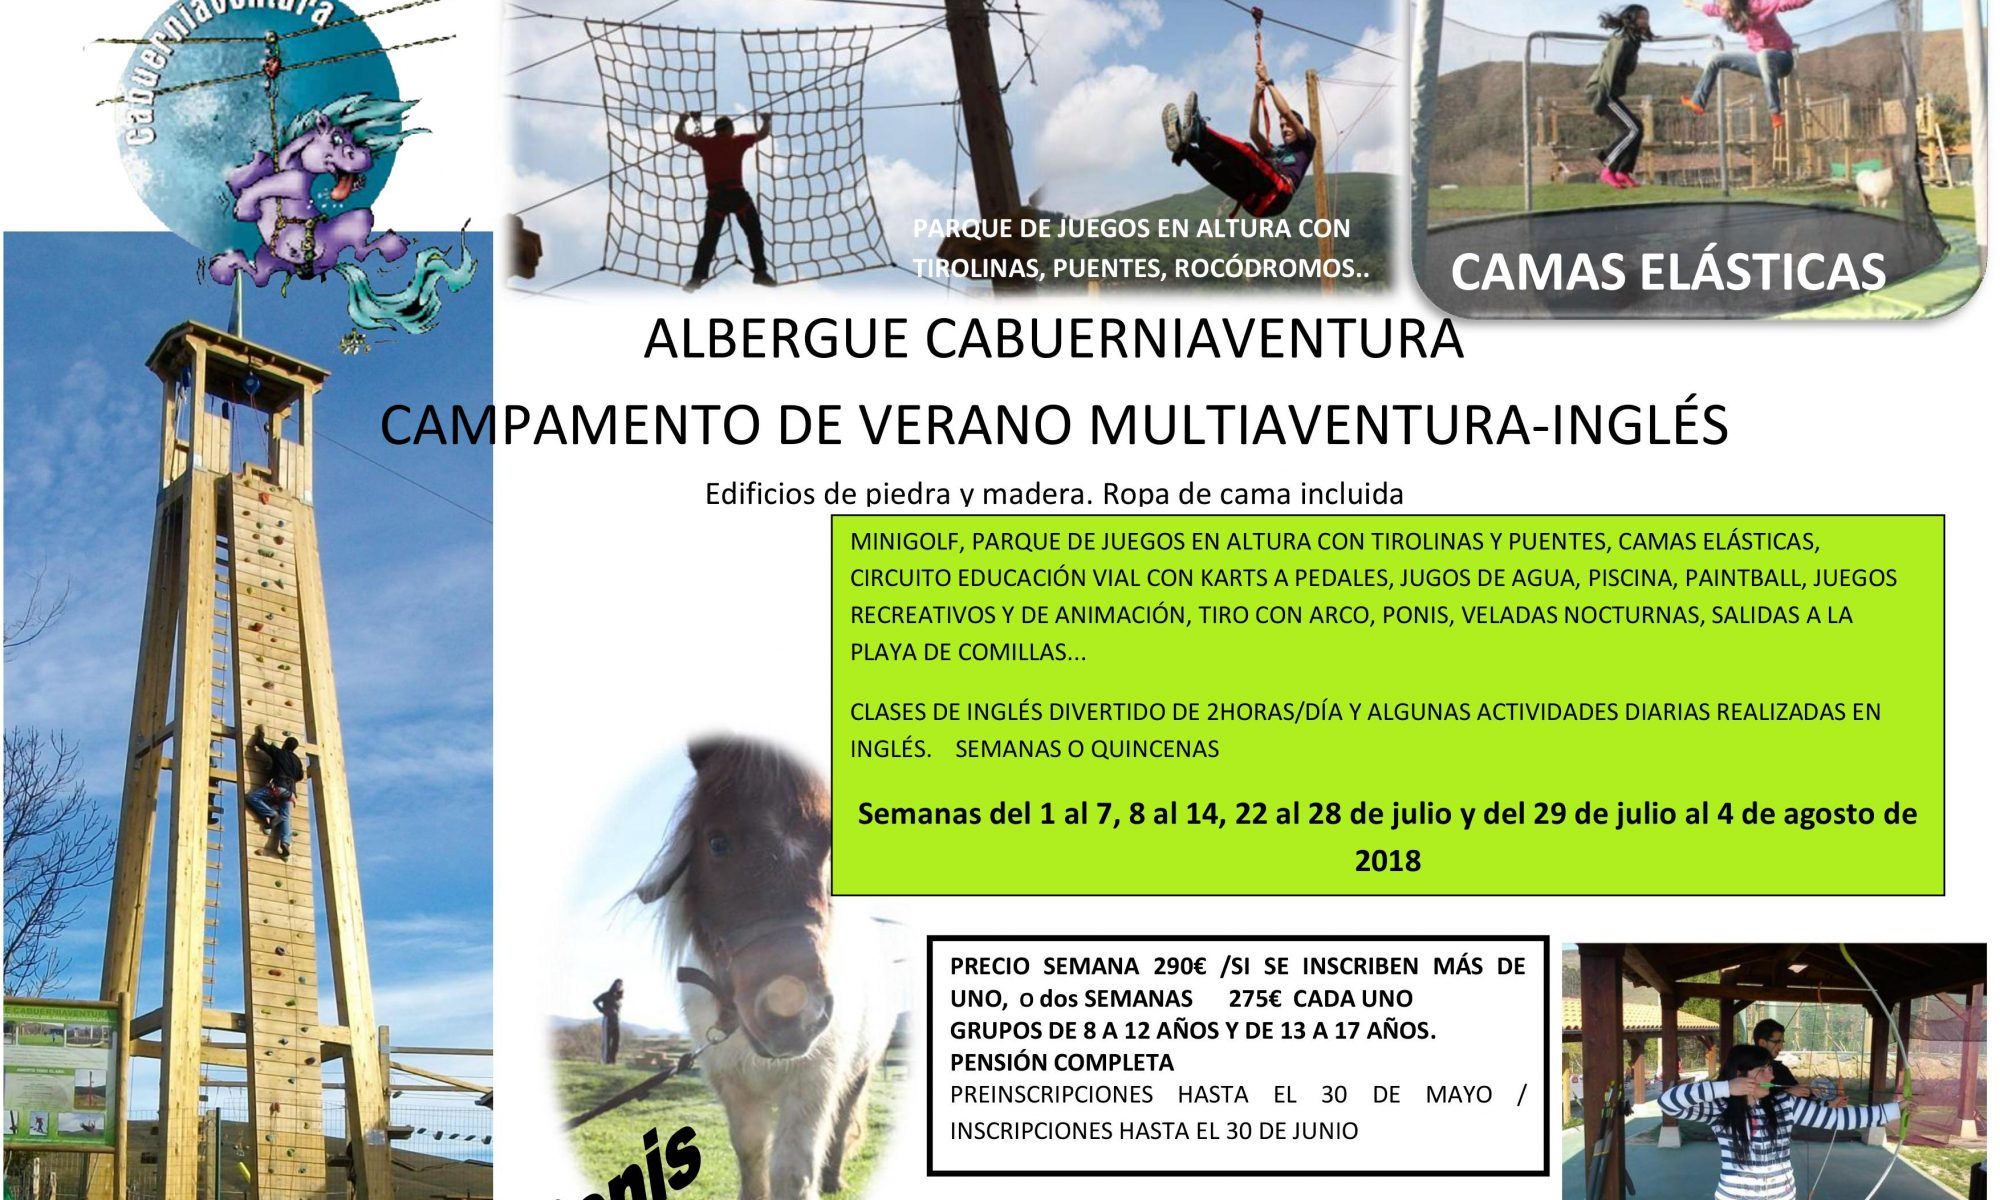 Campamento Multiaventura Inglés 2018 Cabuerniaventura